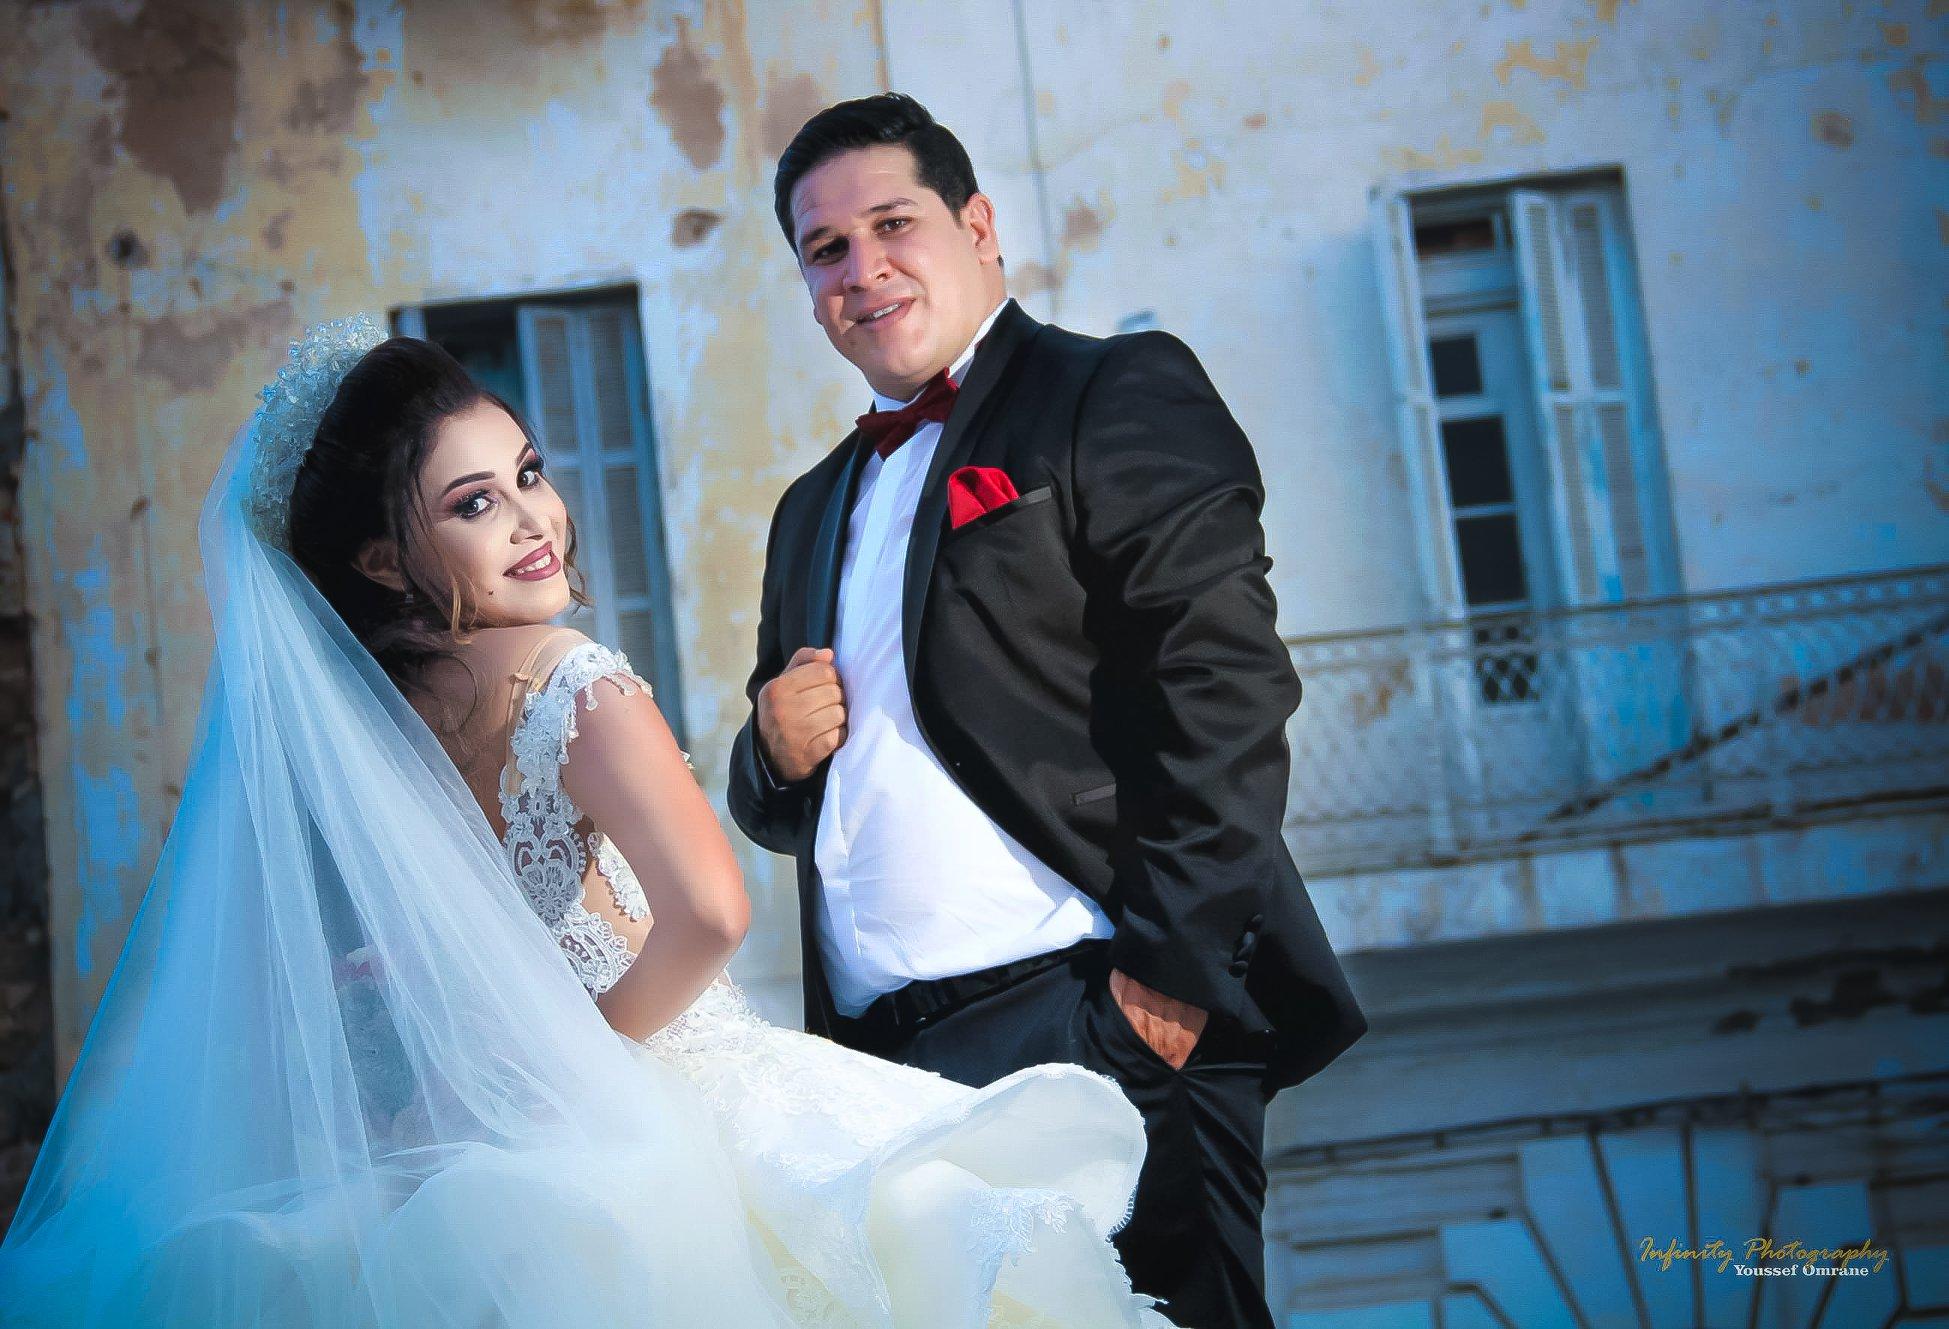 infinity_photographe_top5_meilleures_photos_mariage57_2019